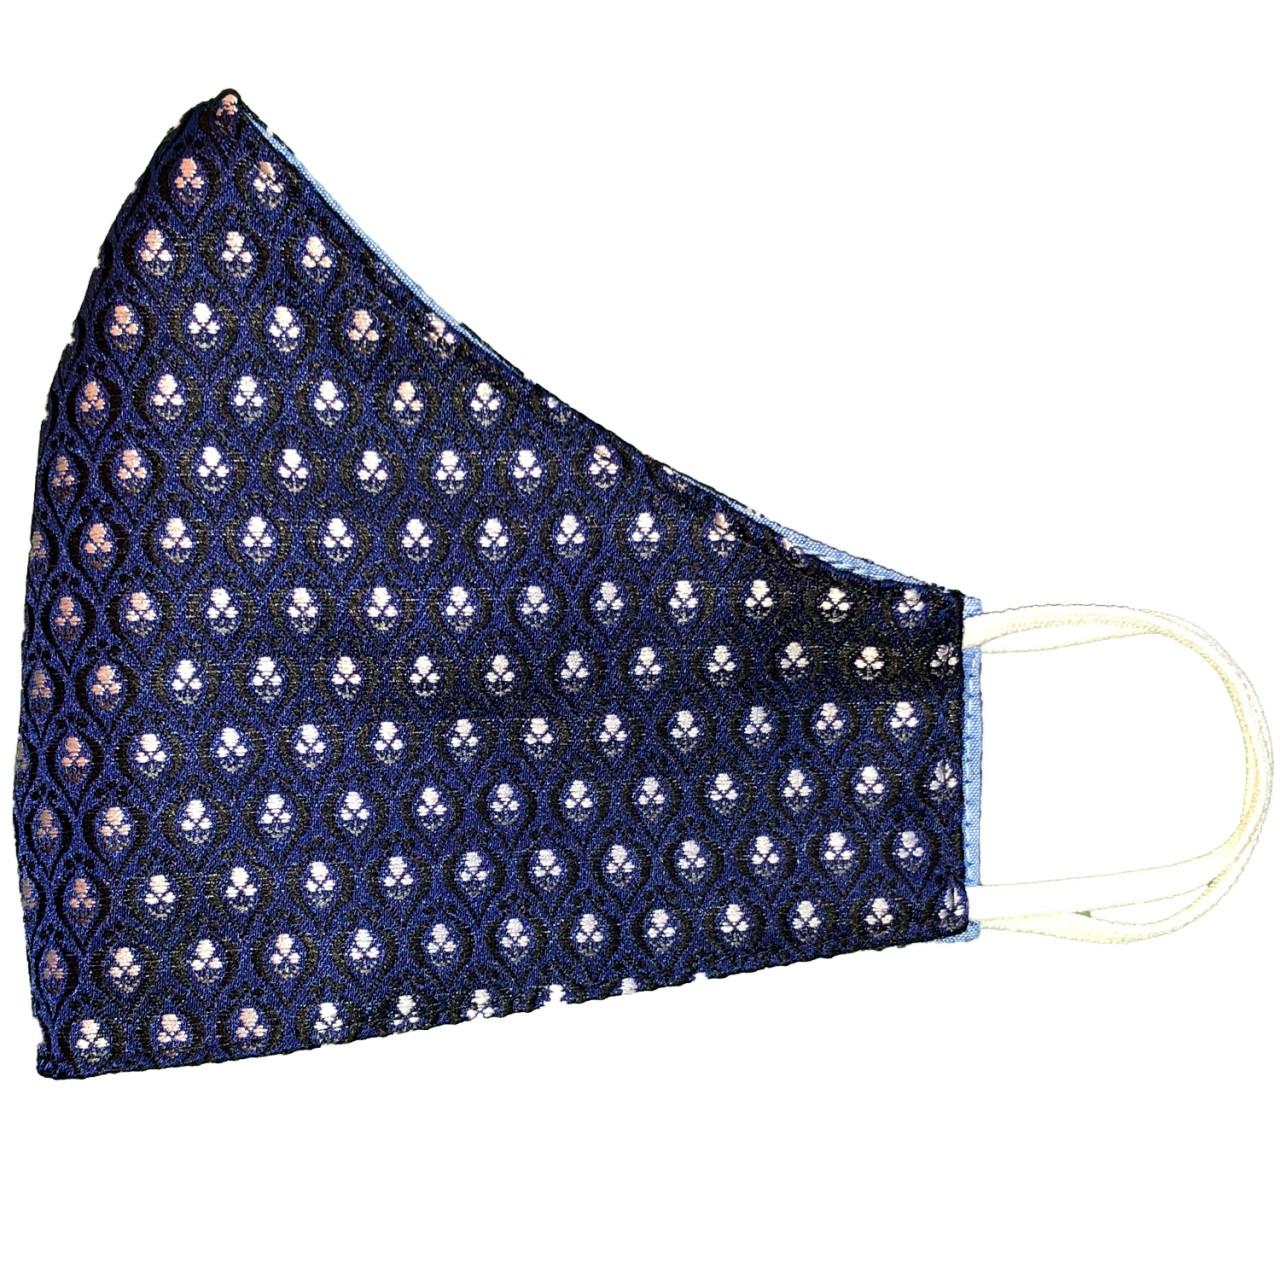 Trachtenmaske blau jacquard